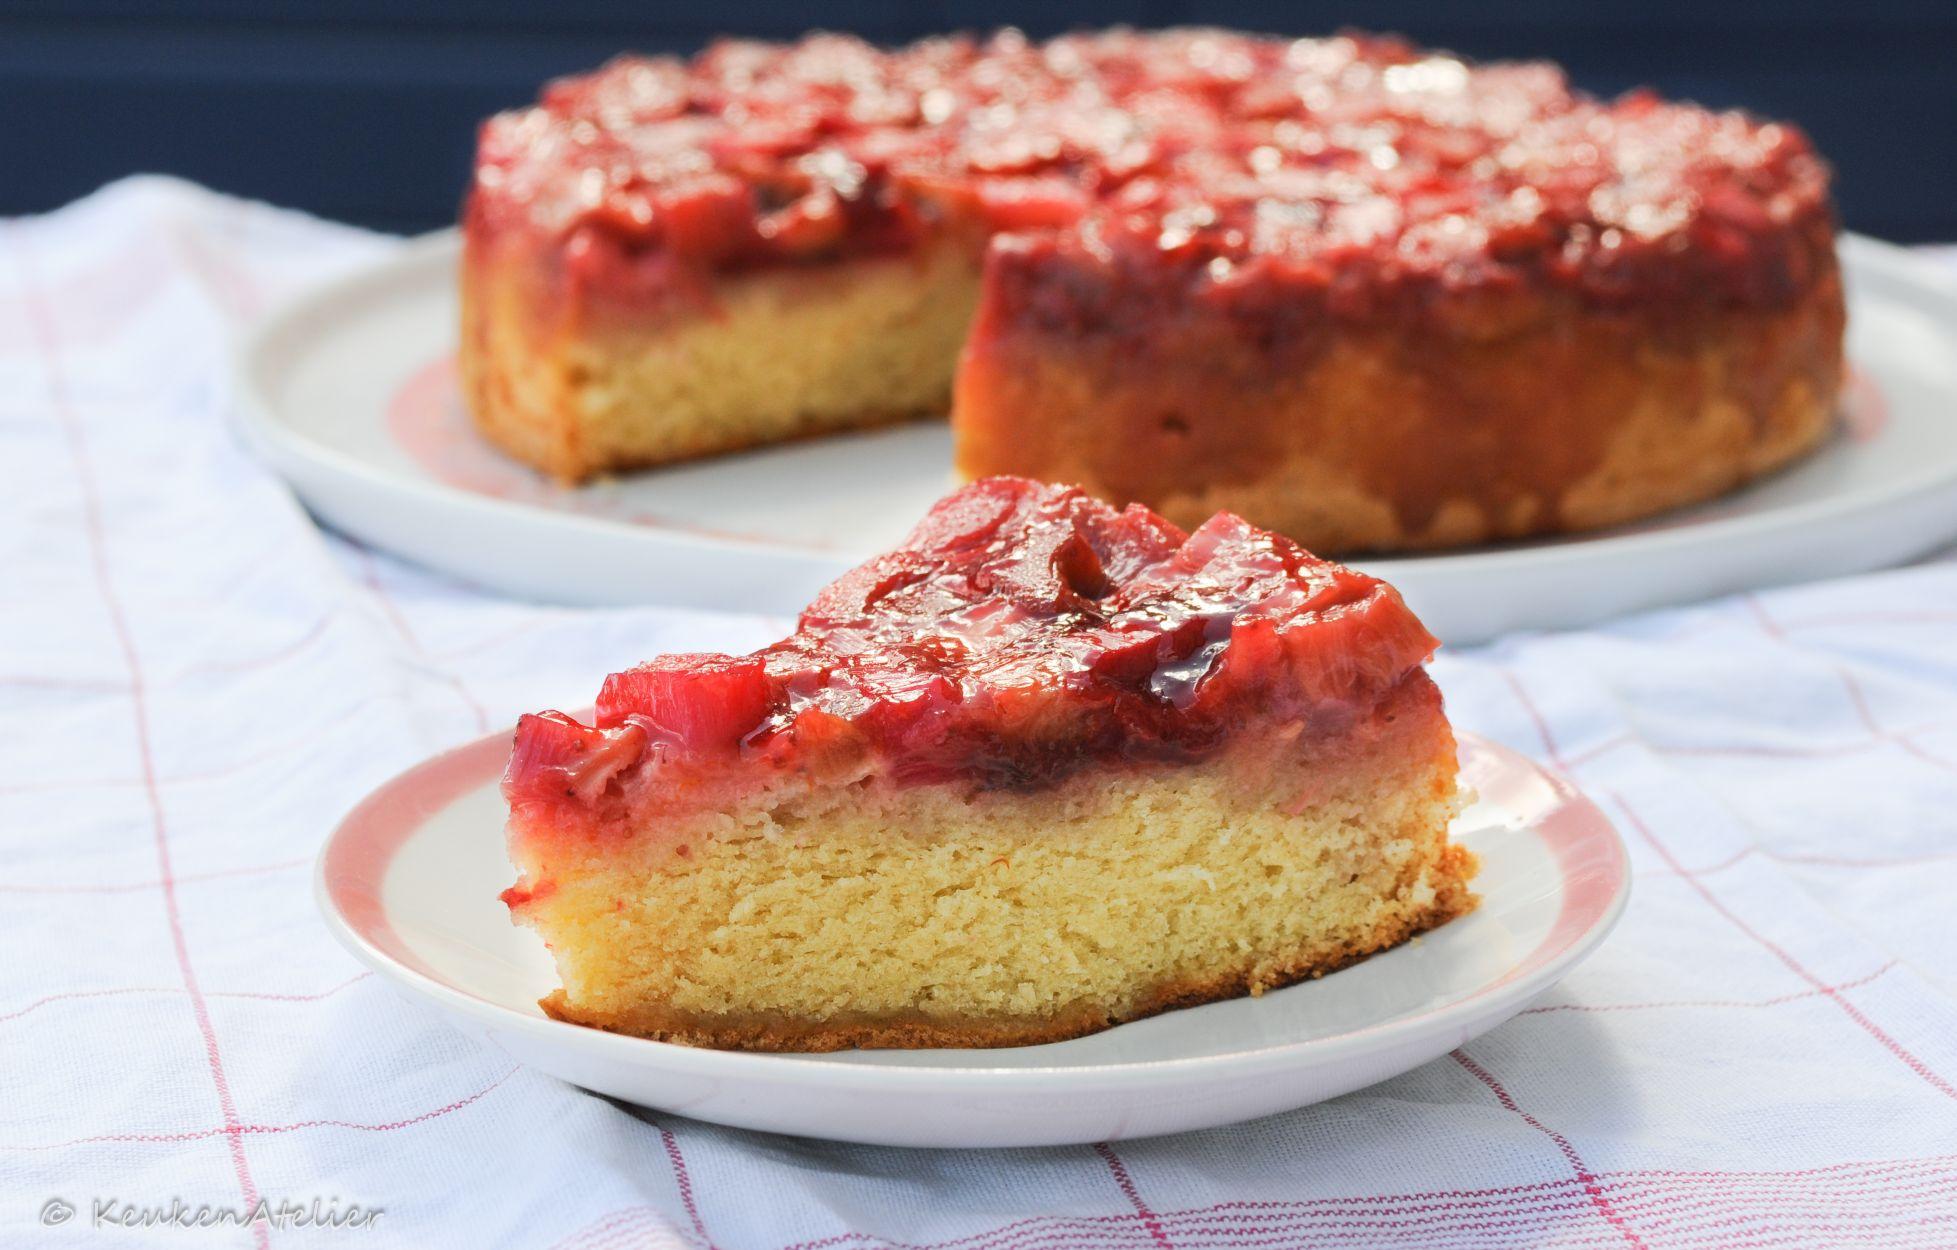 omgekeerde rabarbercake 2